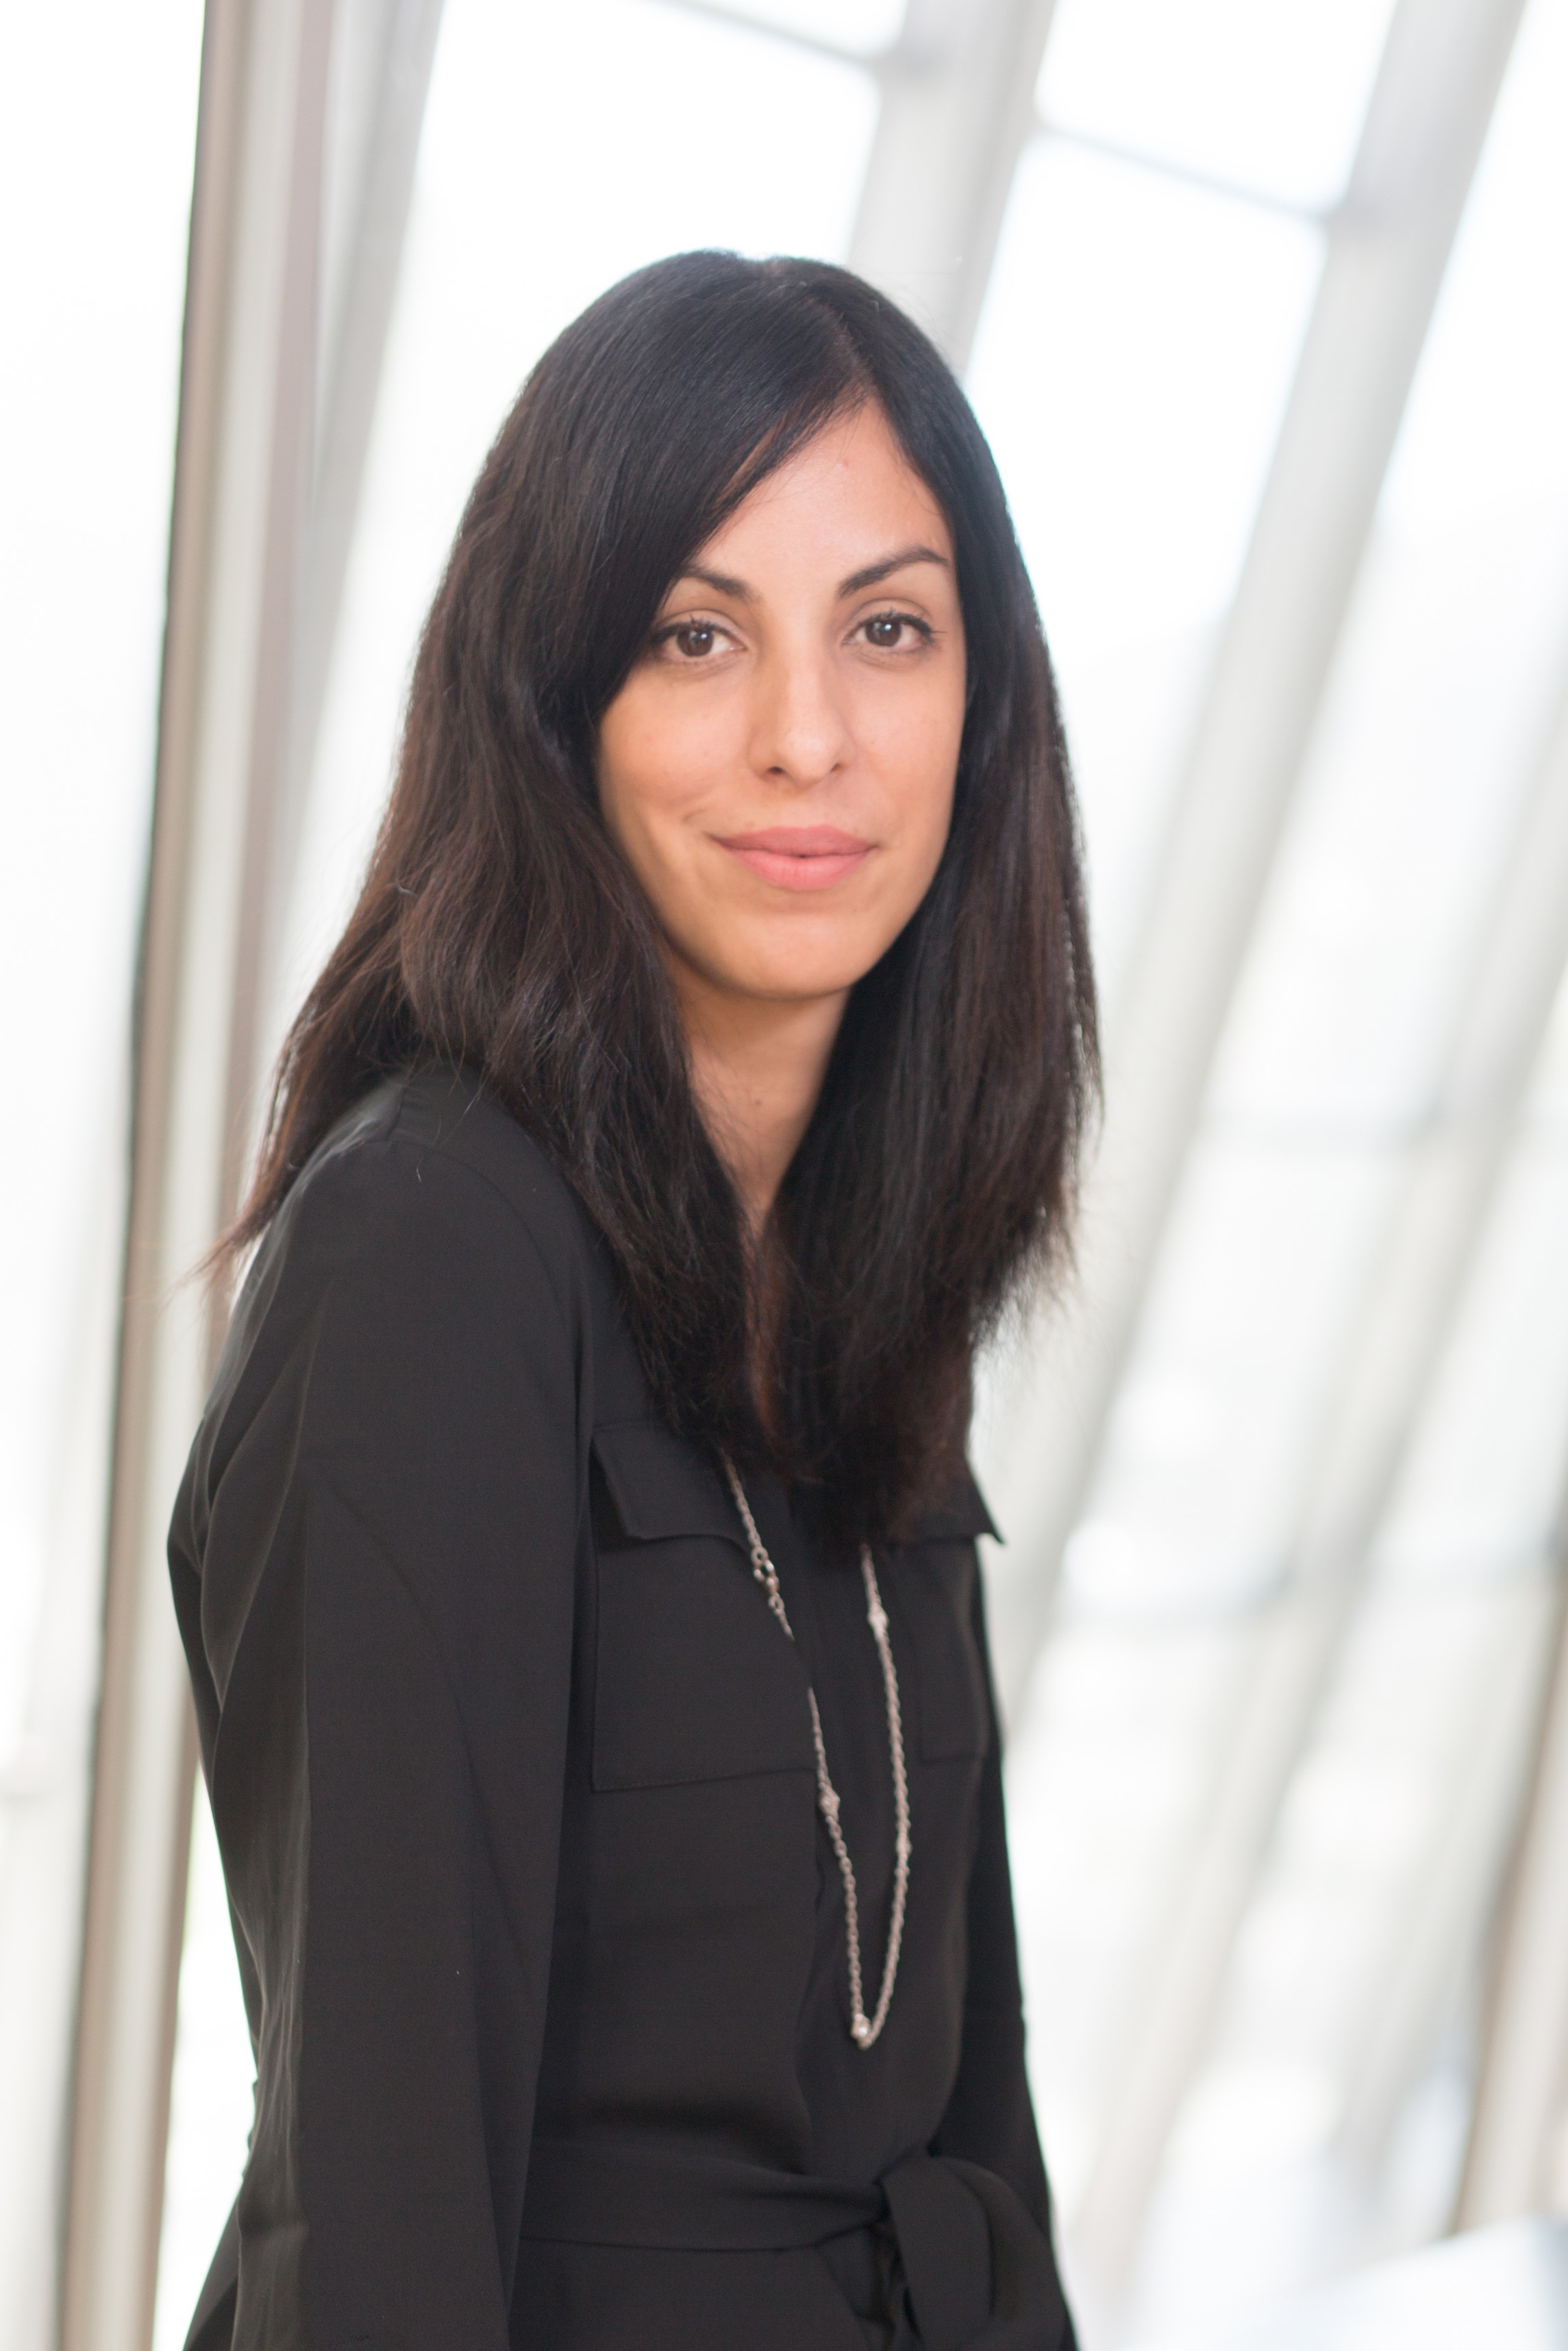 MCA Chicago Hires Carla Acevedo-Yates as Curator